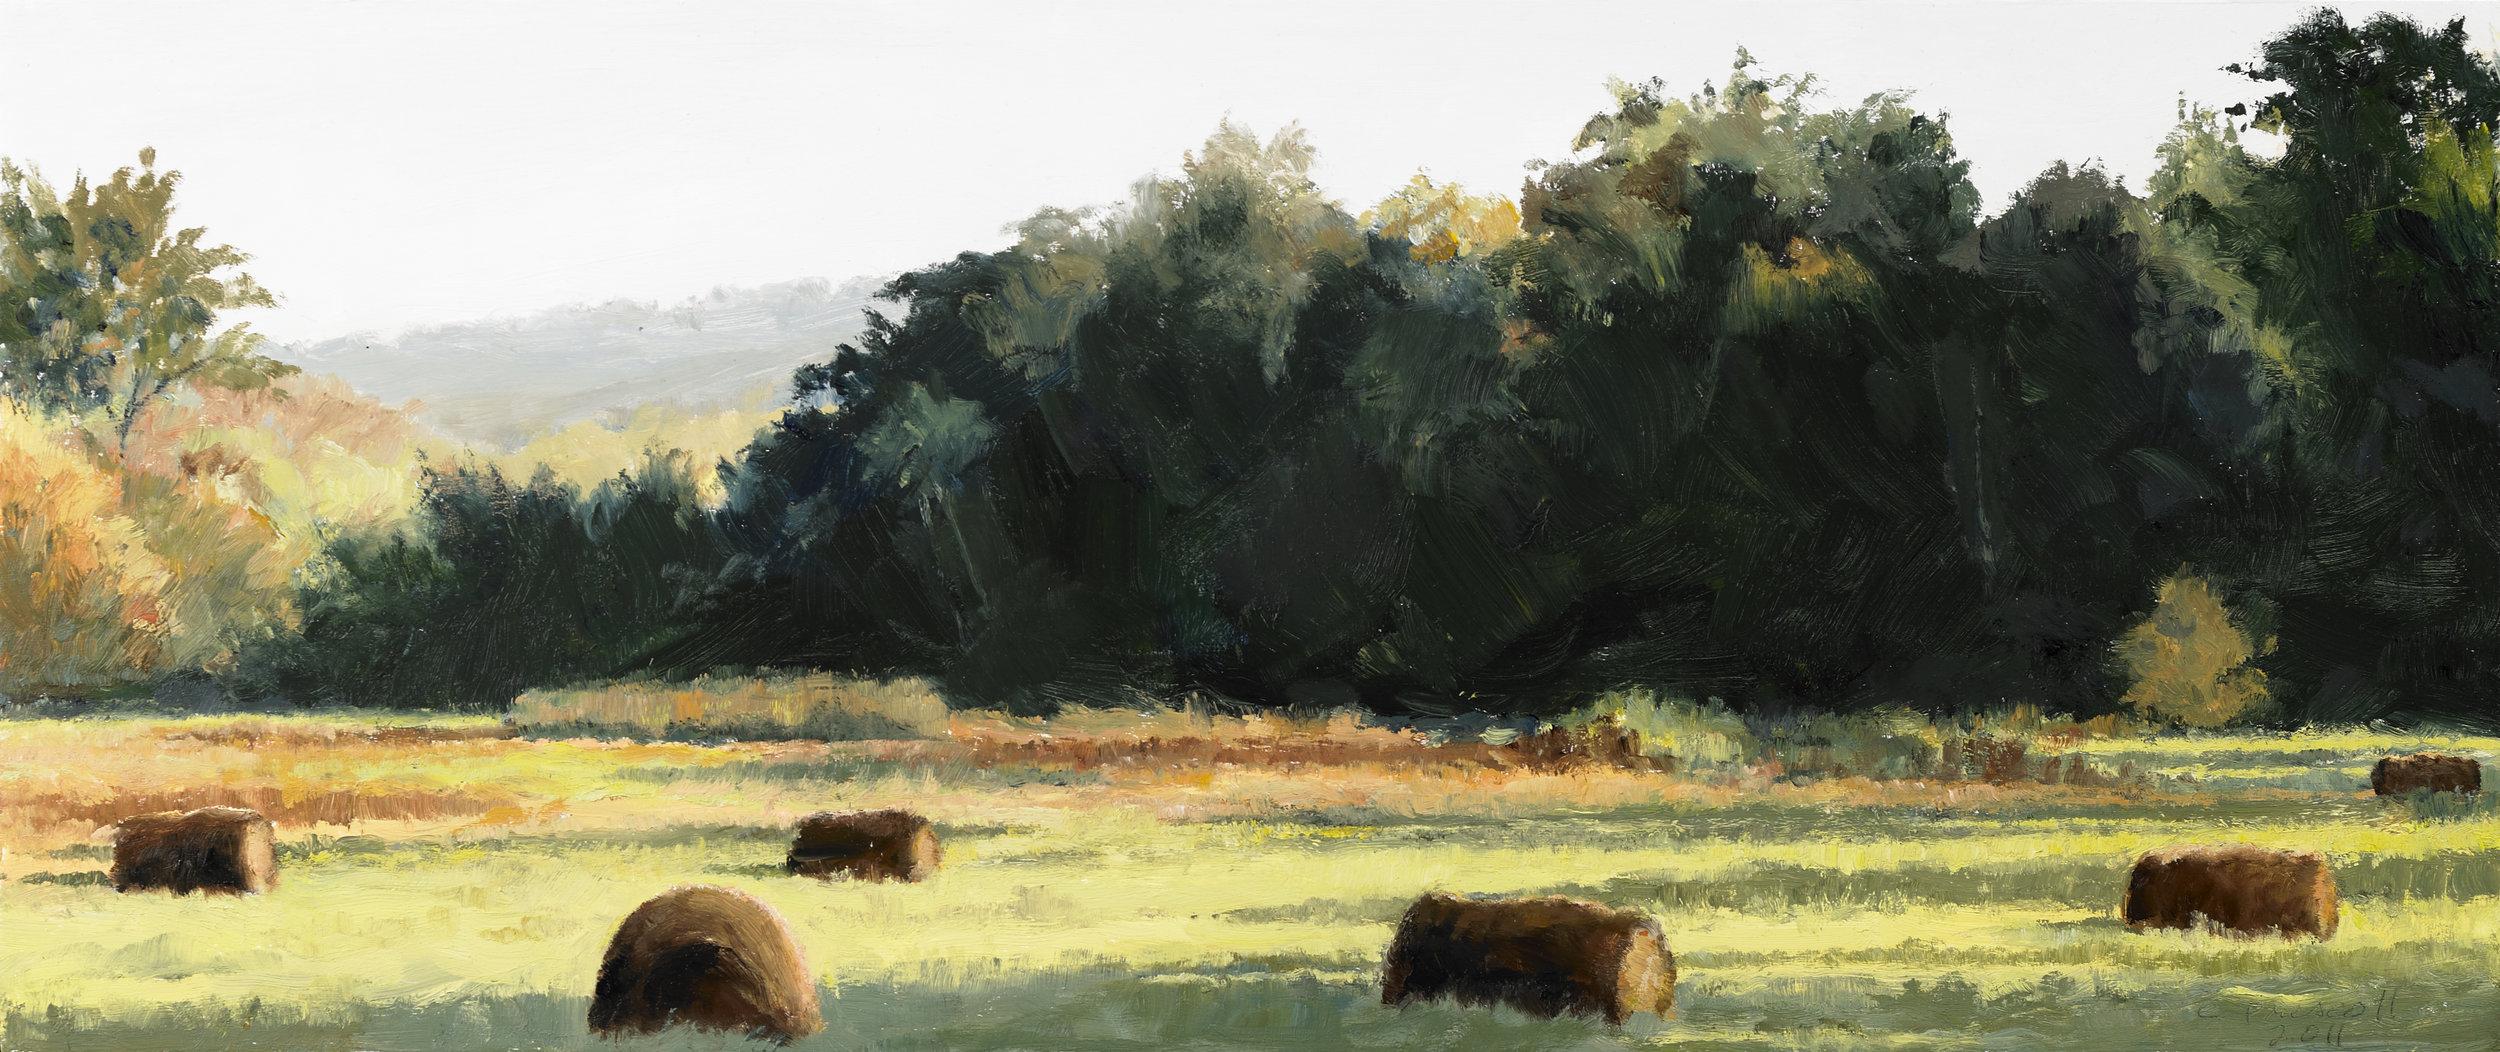 "Hay Bales , Oil on Wood Panel, 2011, 7 5/8"" x 18"""